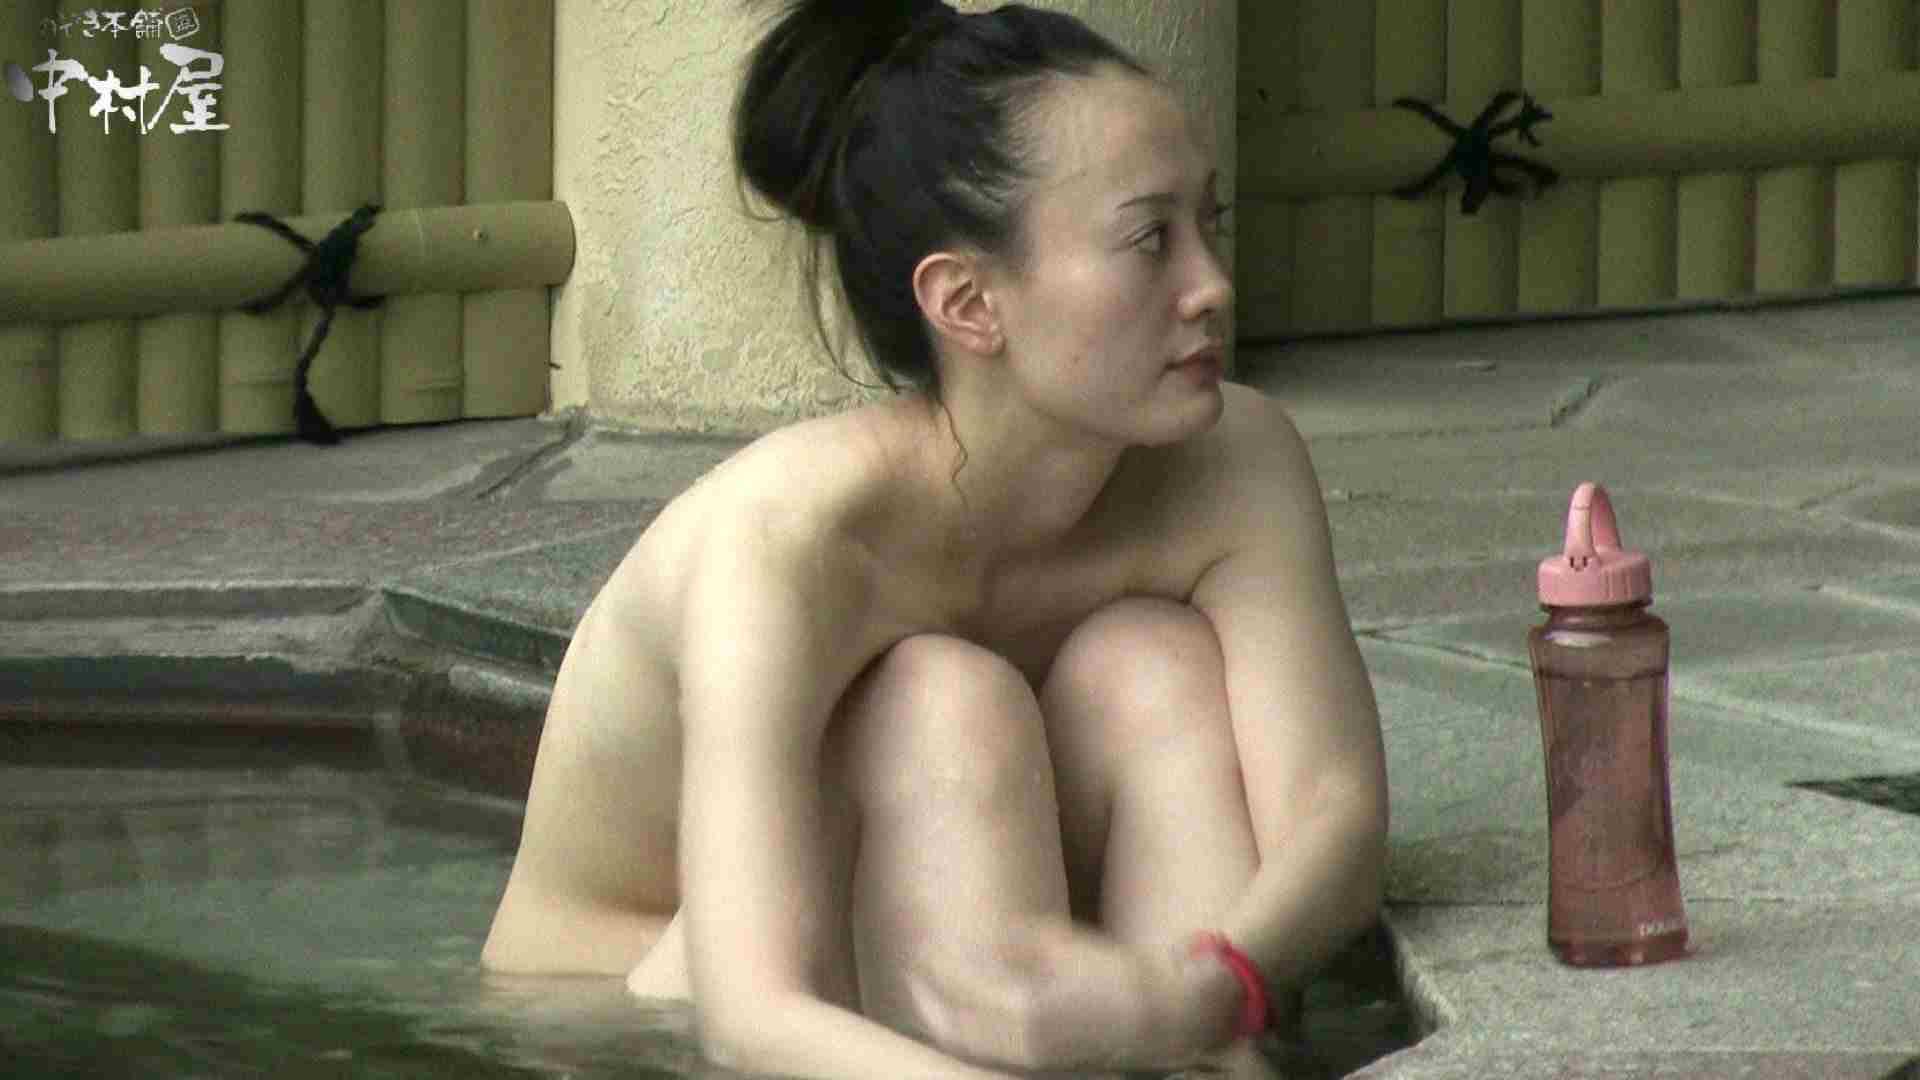 Aquaな露天風呂Vol.900 美しいOLの裸体   露天風呂突入  86pic 70